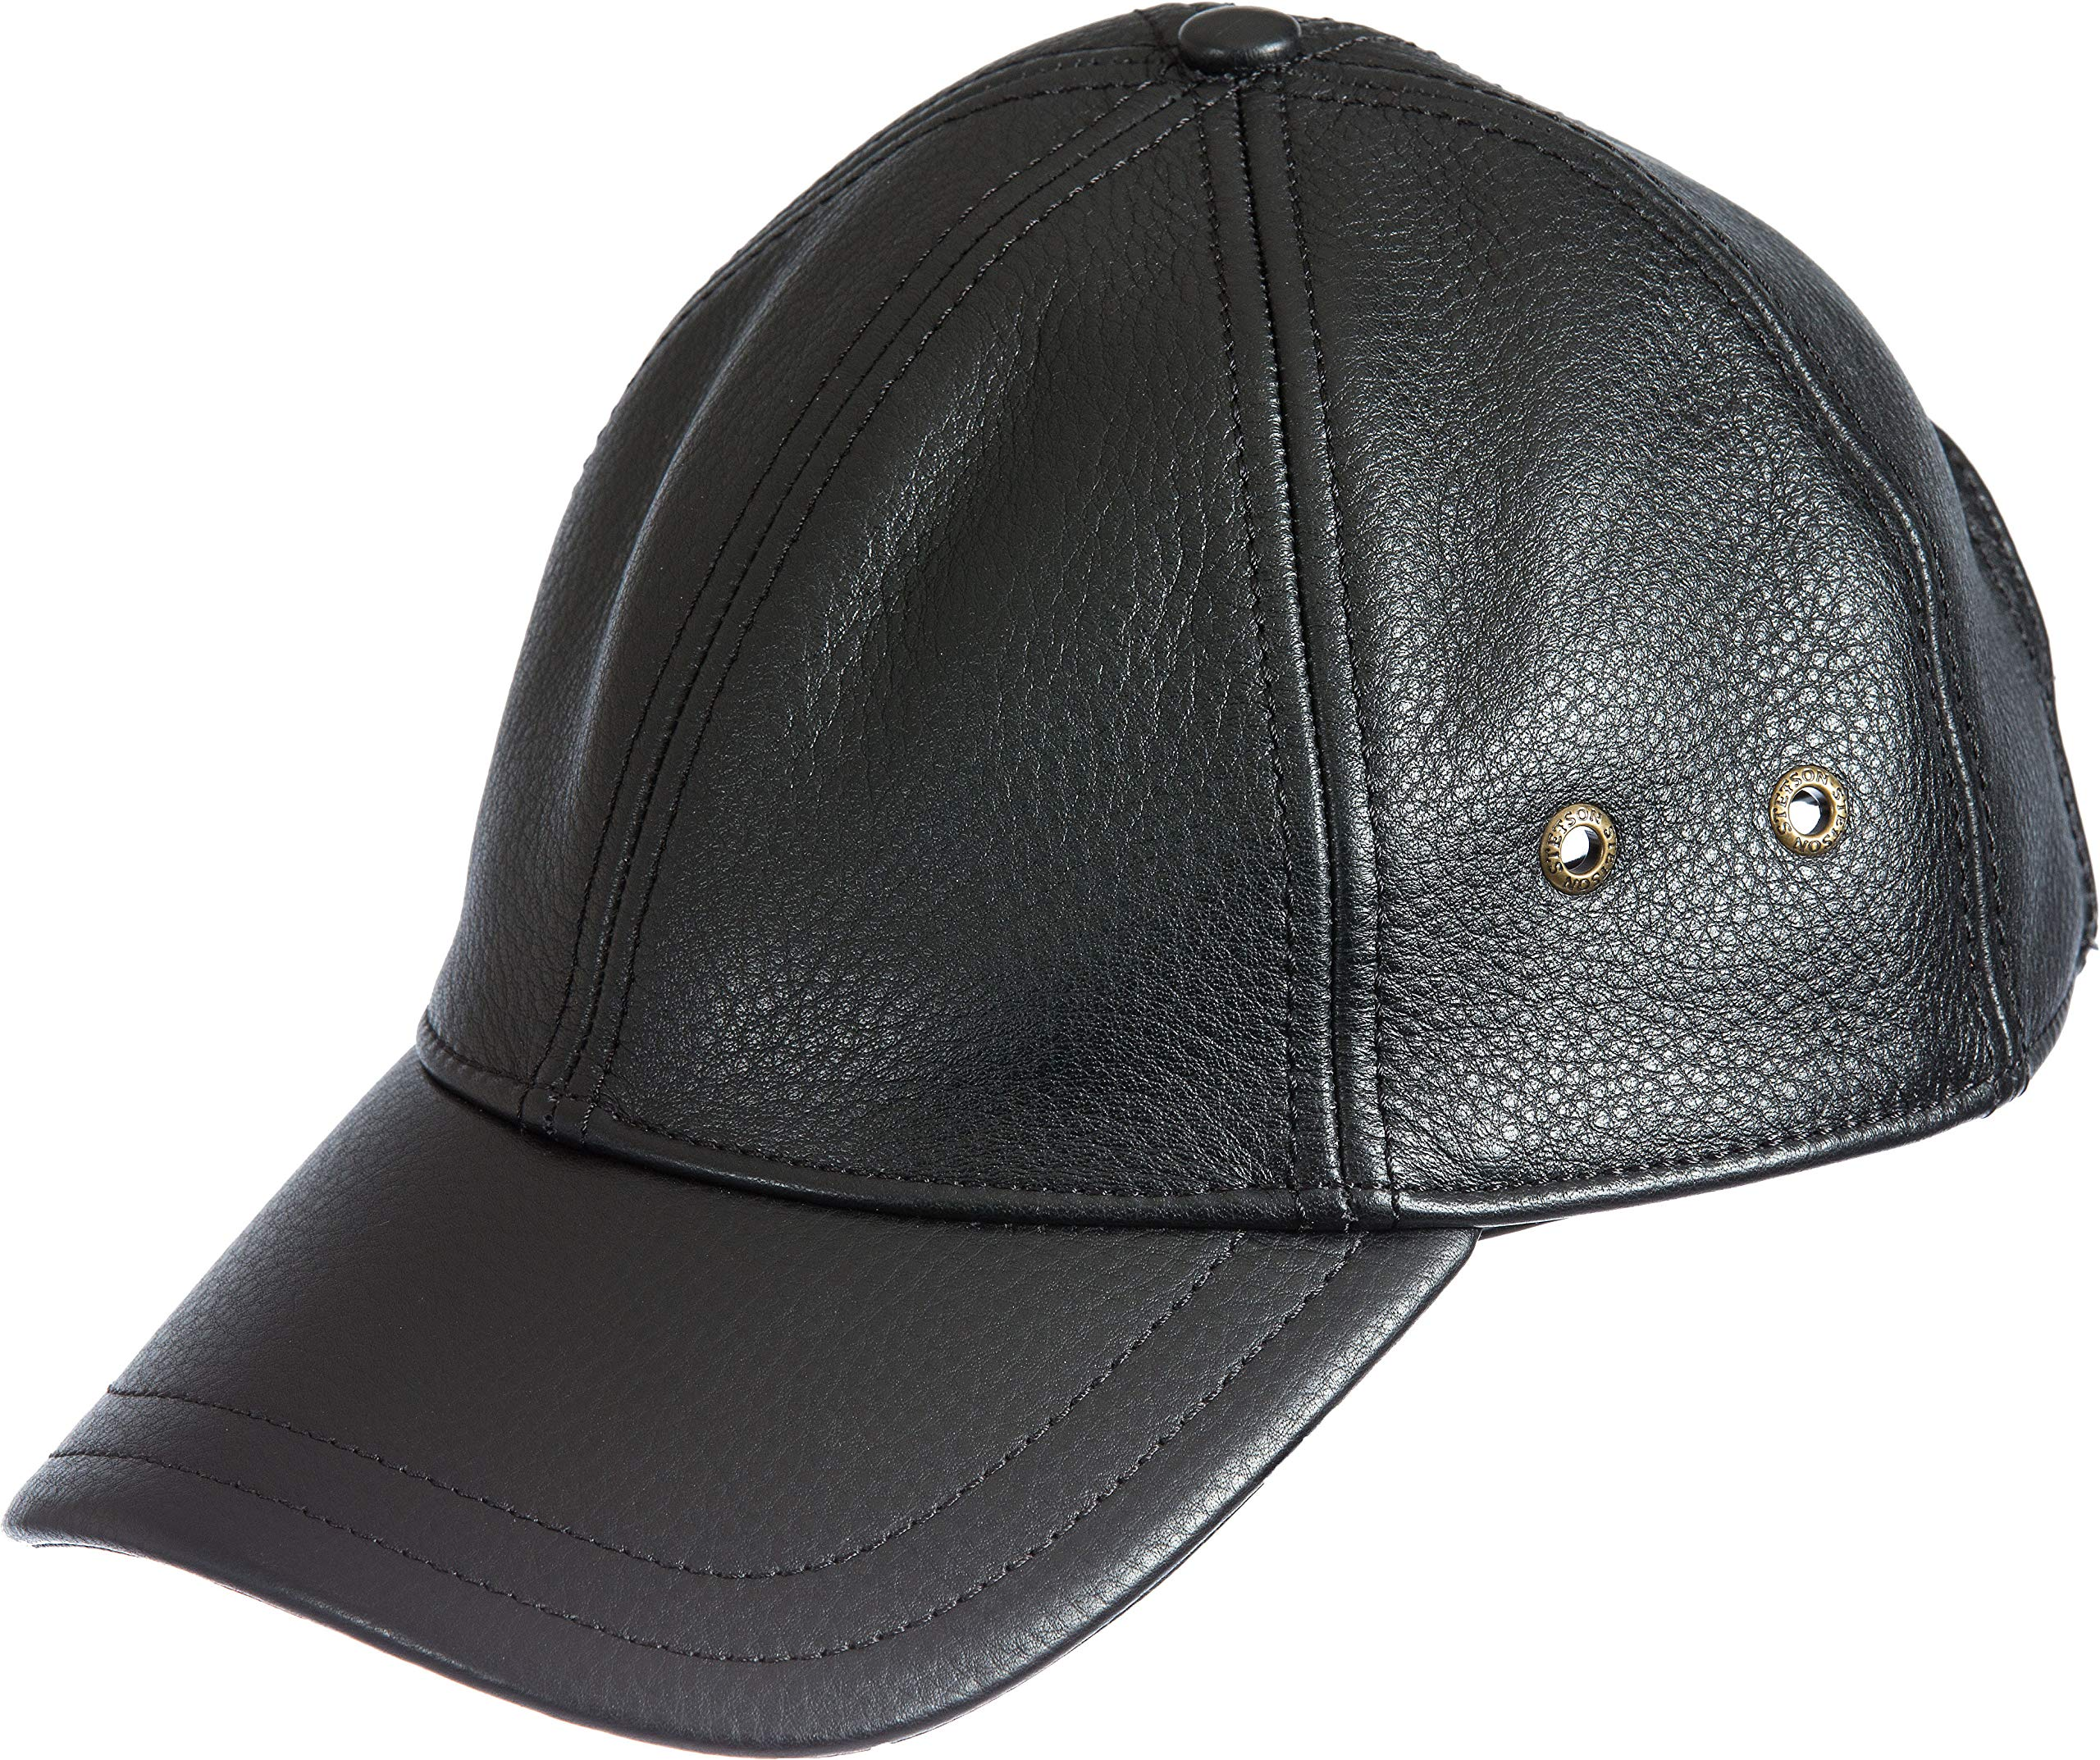 Overland Sheepskin Co Antique Leather Baseball Cap Black